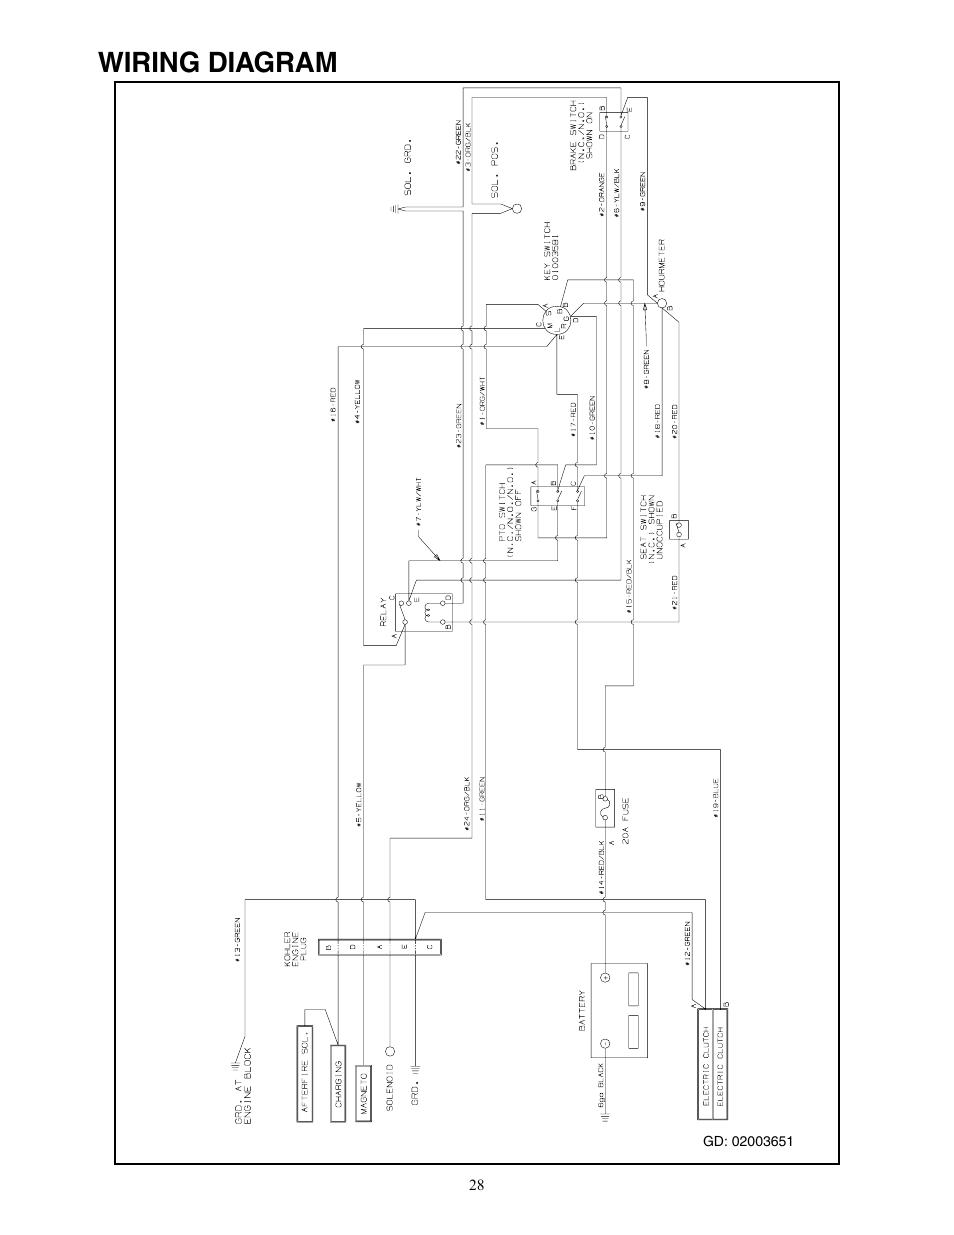 Unique Cub Cadet 3184 Wiring Diagram Composition - Wiring Diagram ...